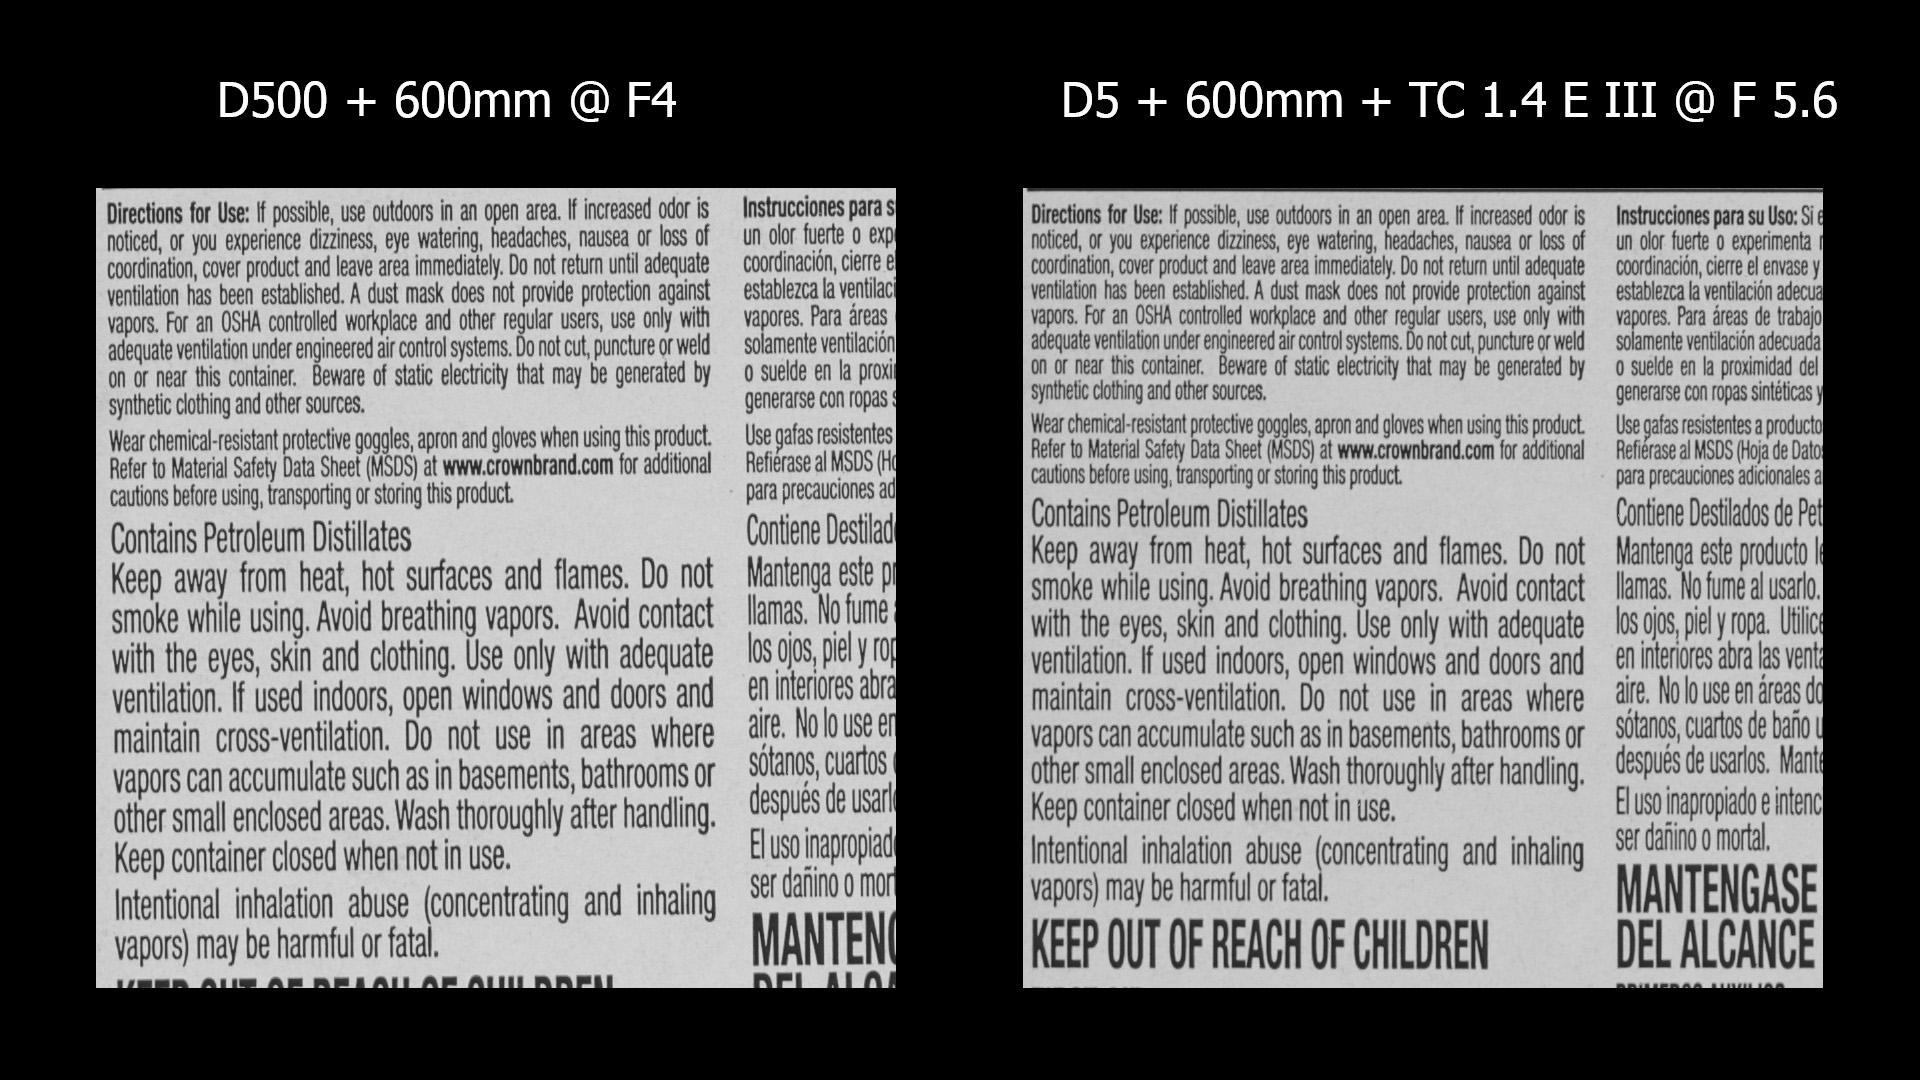 tc-examples-d5d500-600-wideopen